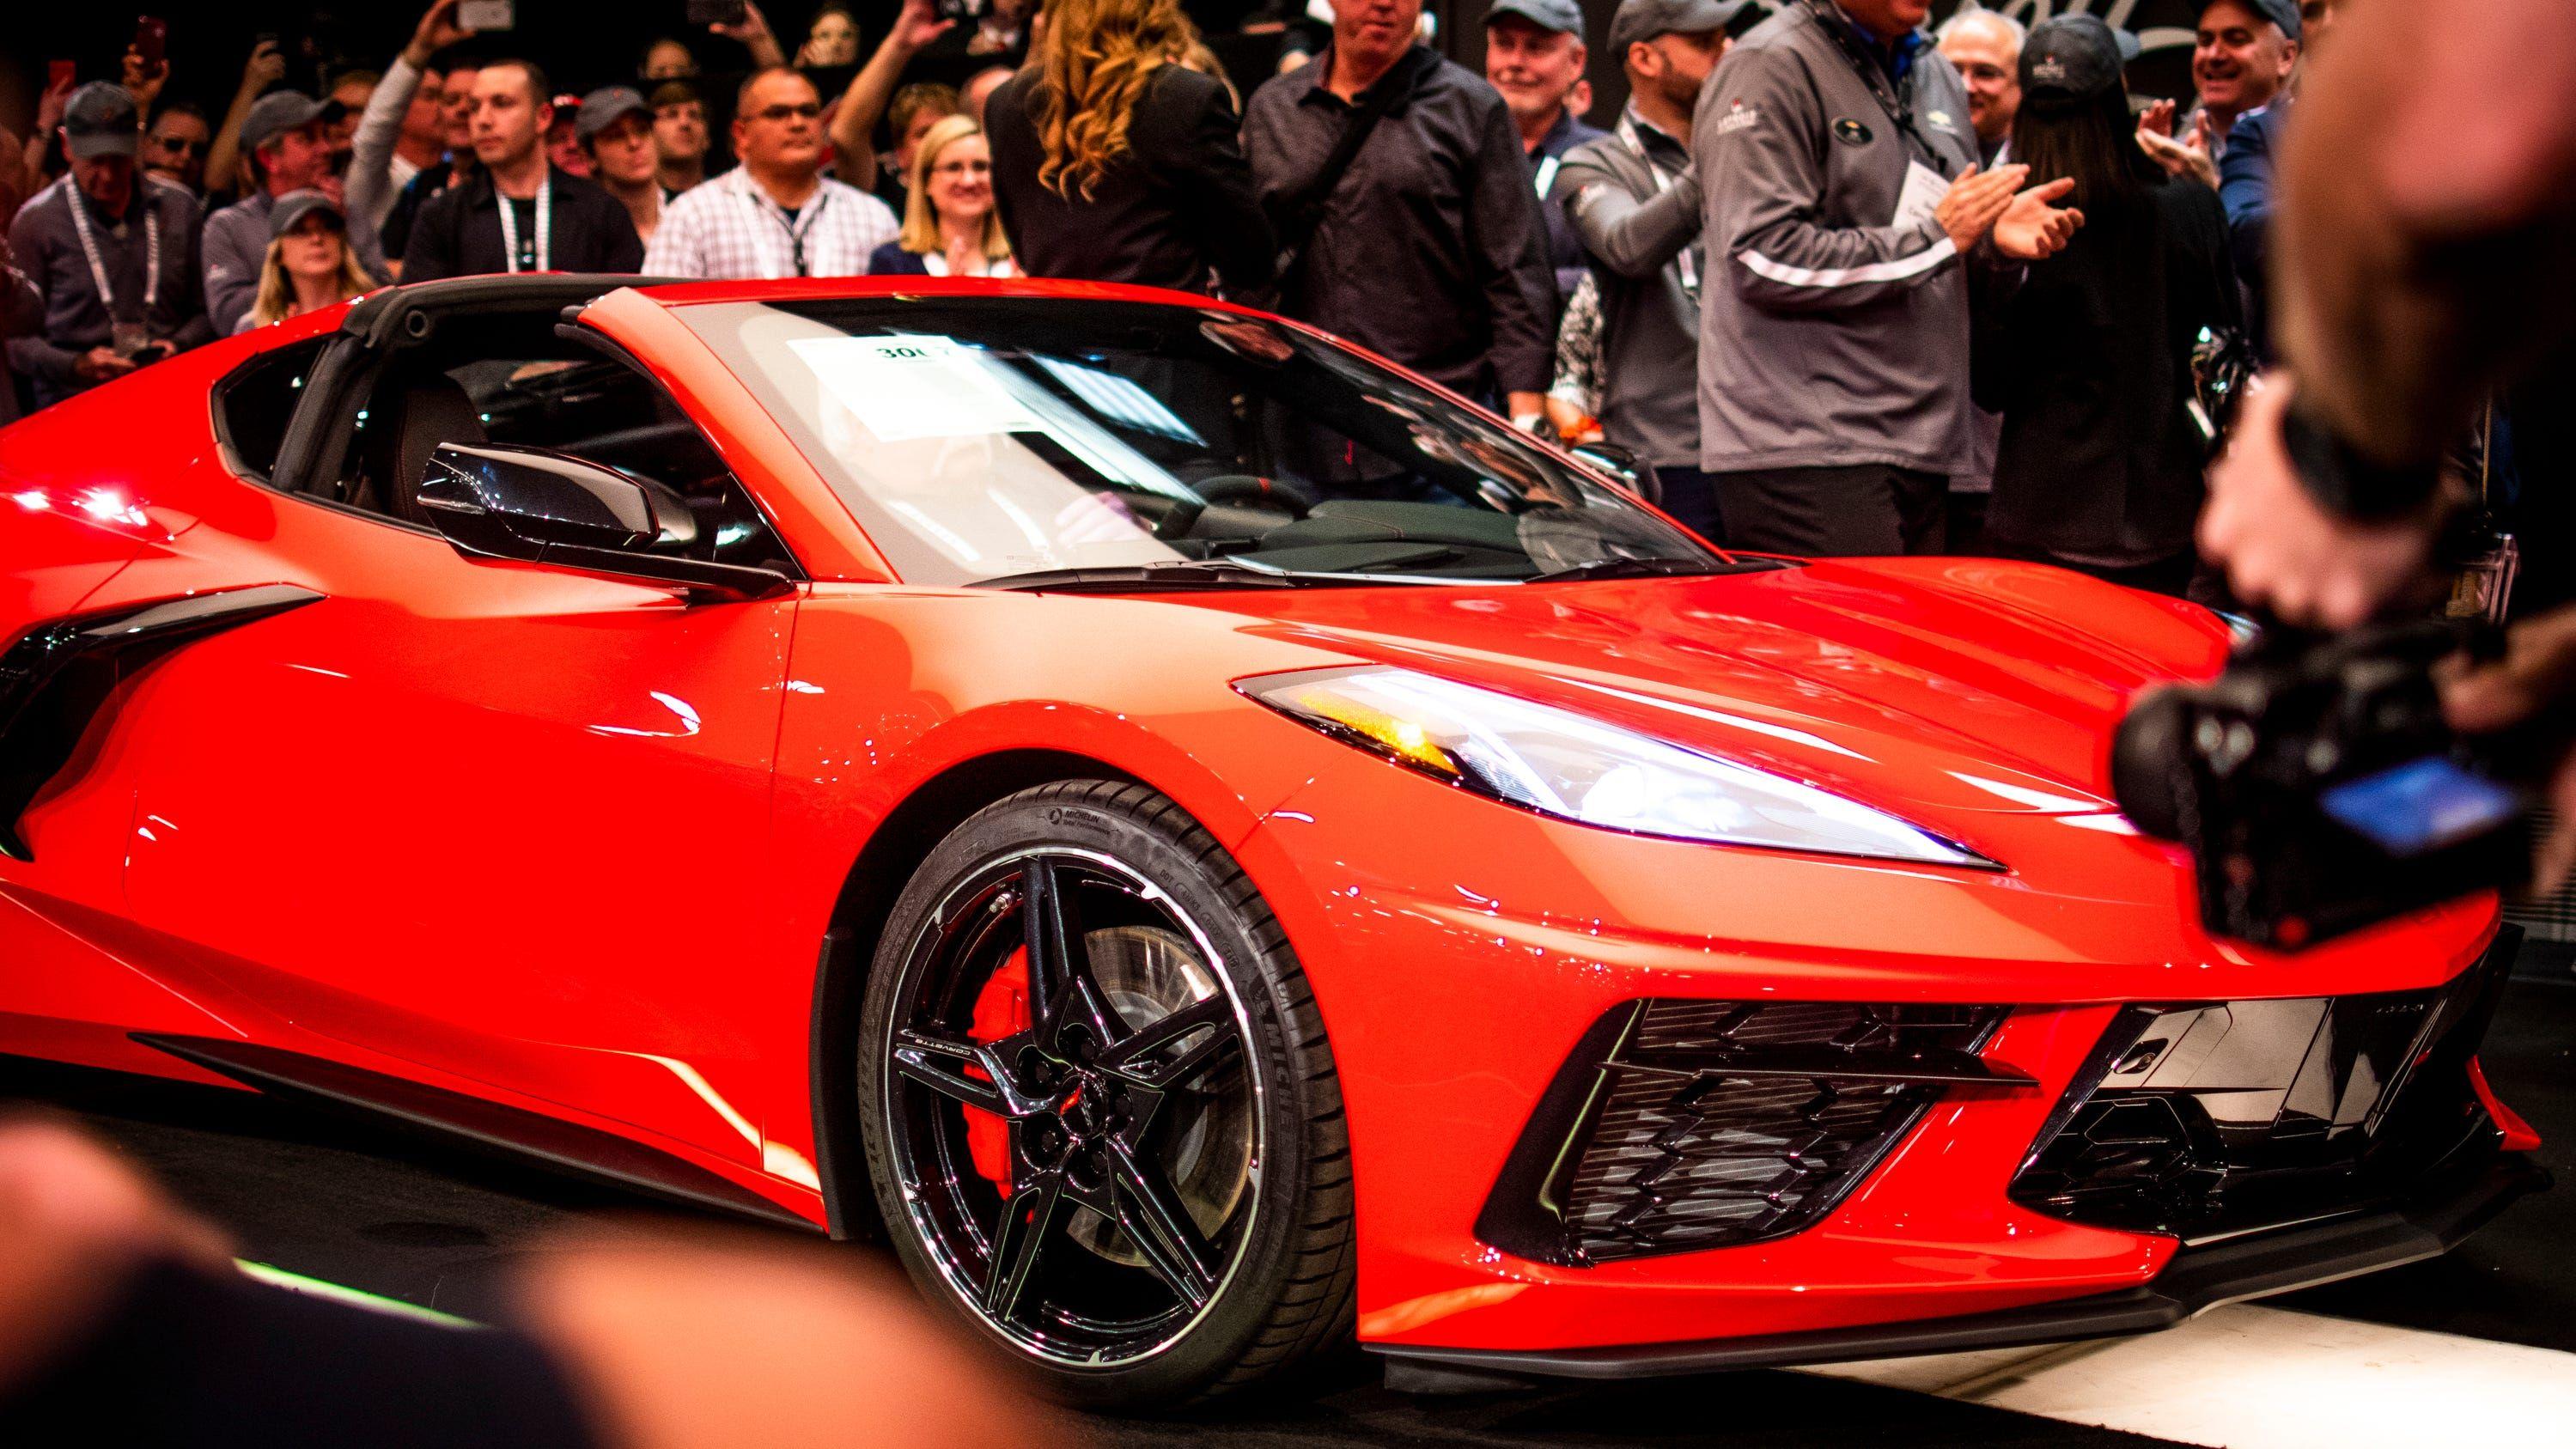 2020 Chevrolet C8 Corvette Stingray Coupe Sells For 3 Million At Arizona Auction Social Media Images Corvette Coupe